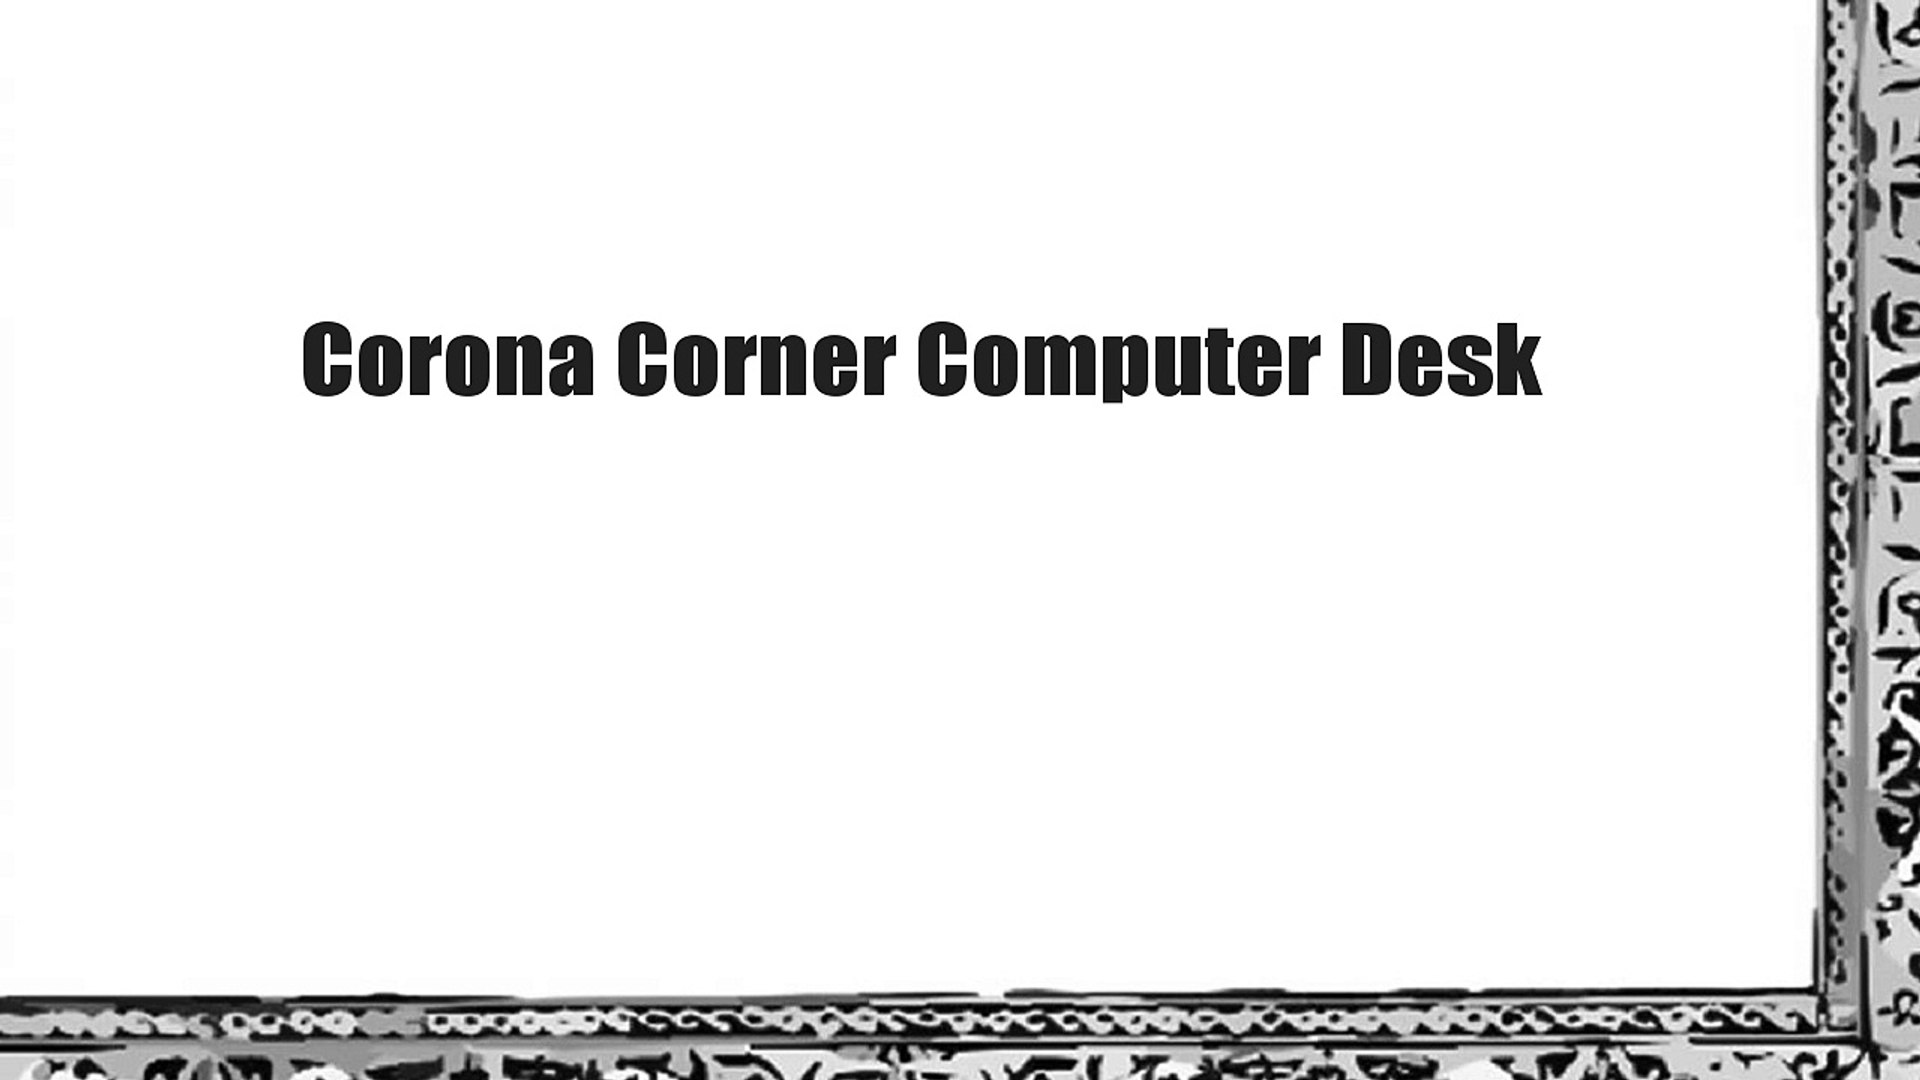 Corona Corner Computer Desk